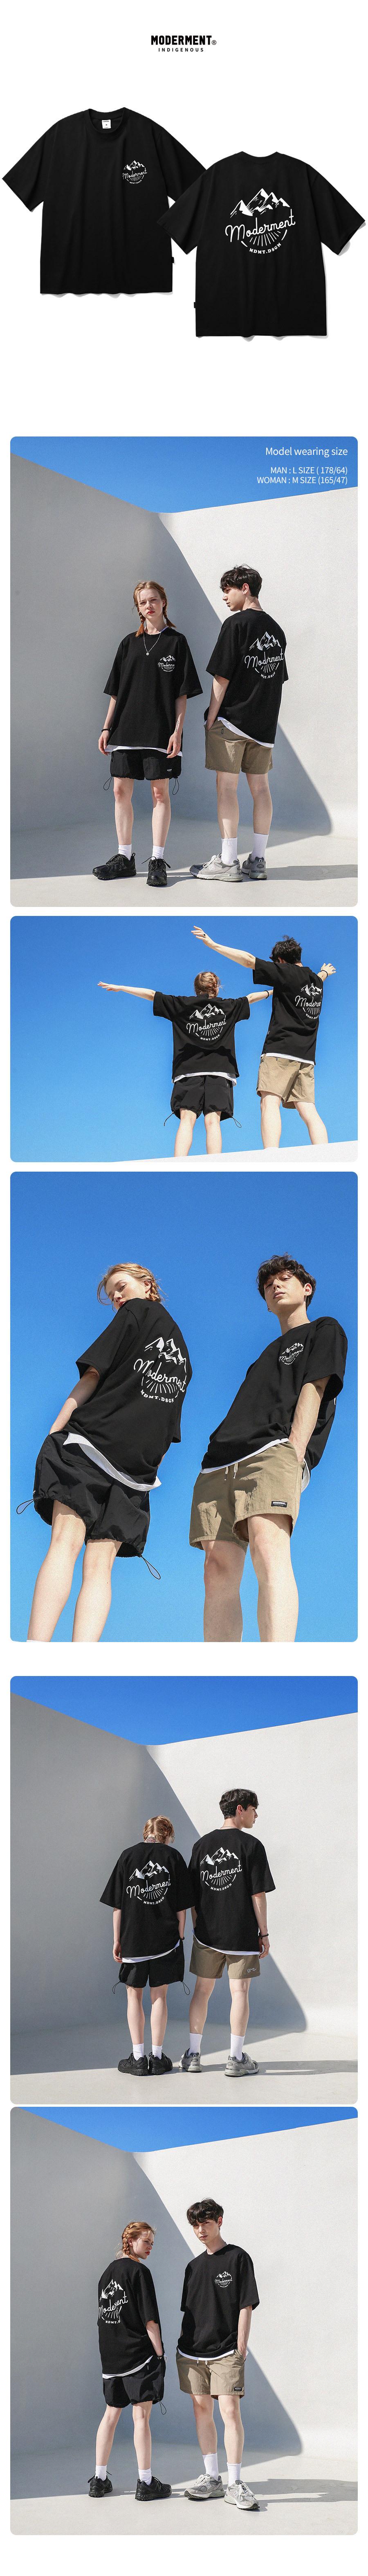 [UNISEX] 마운틴 오버핏 반팔 티셔츠 (블랙)